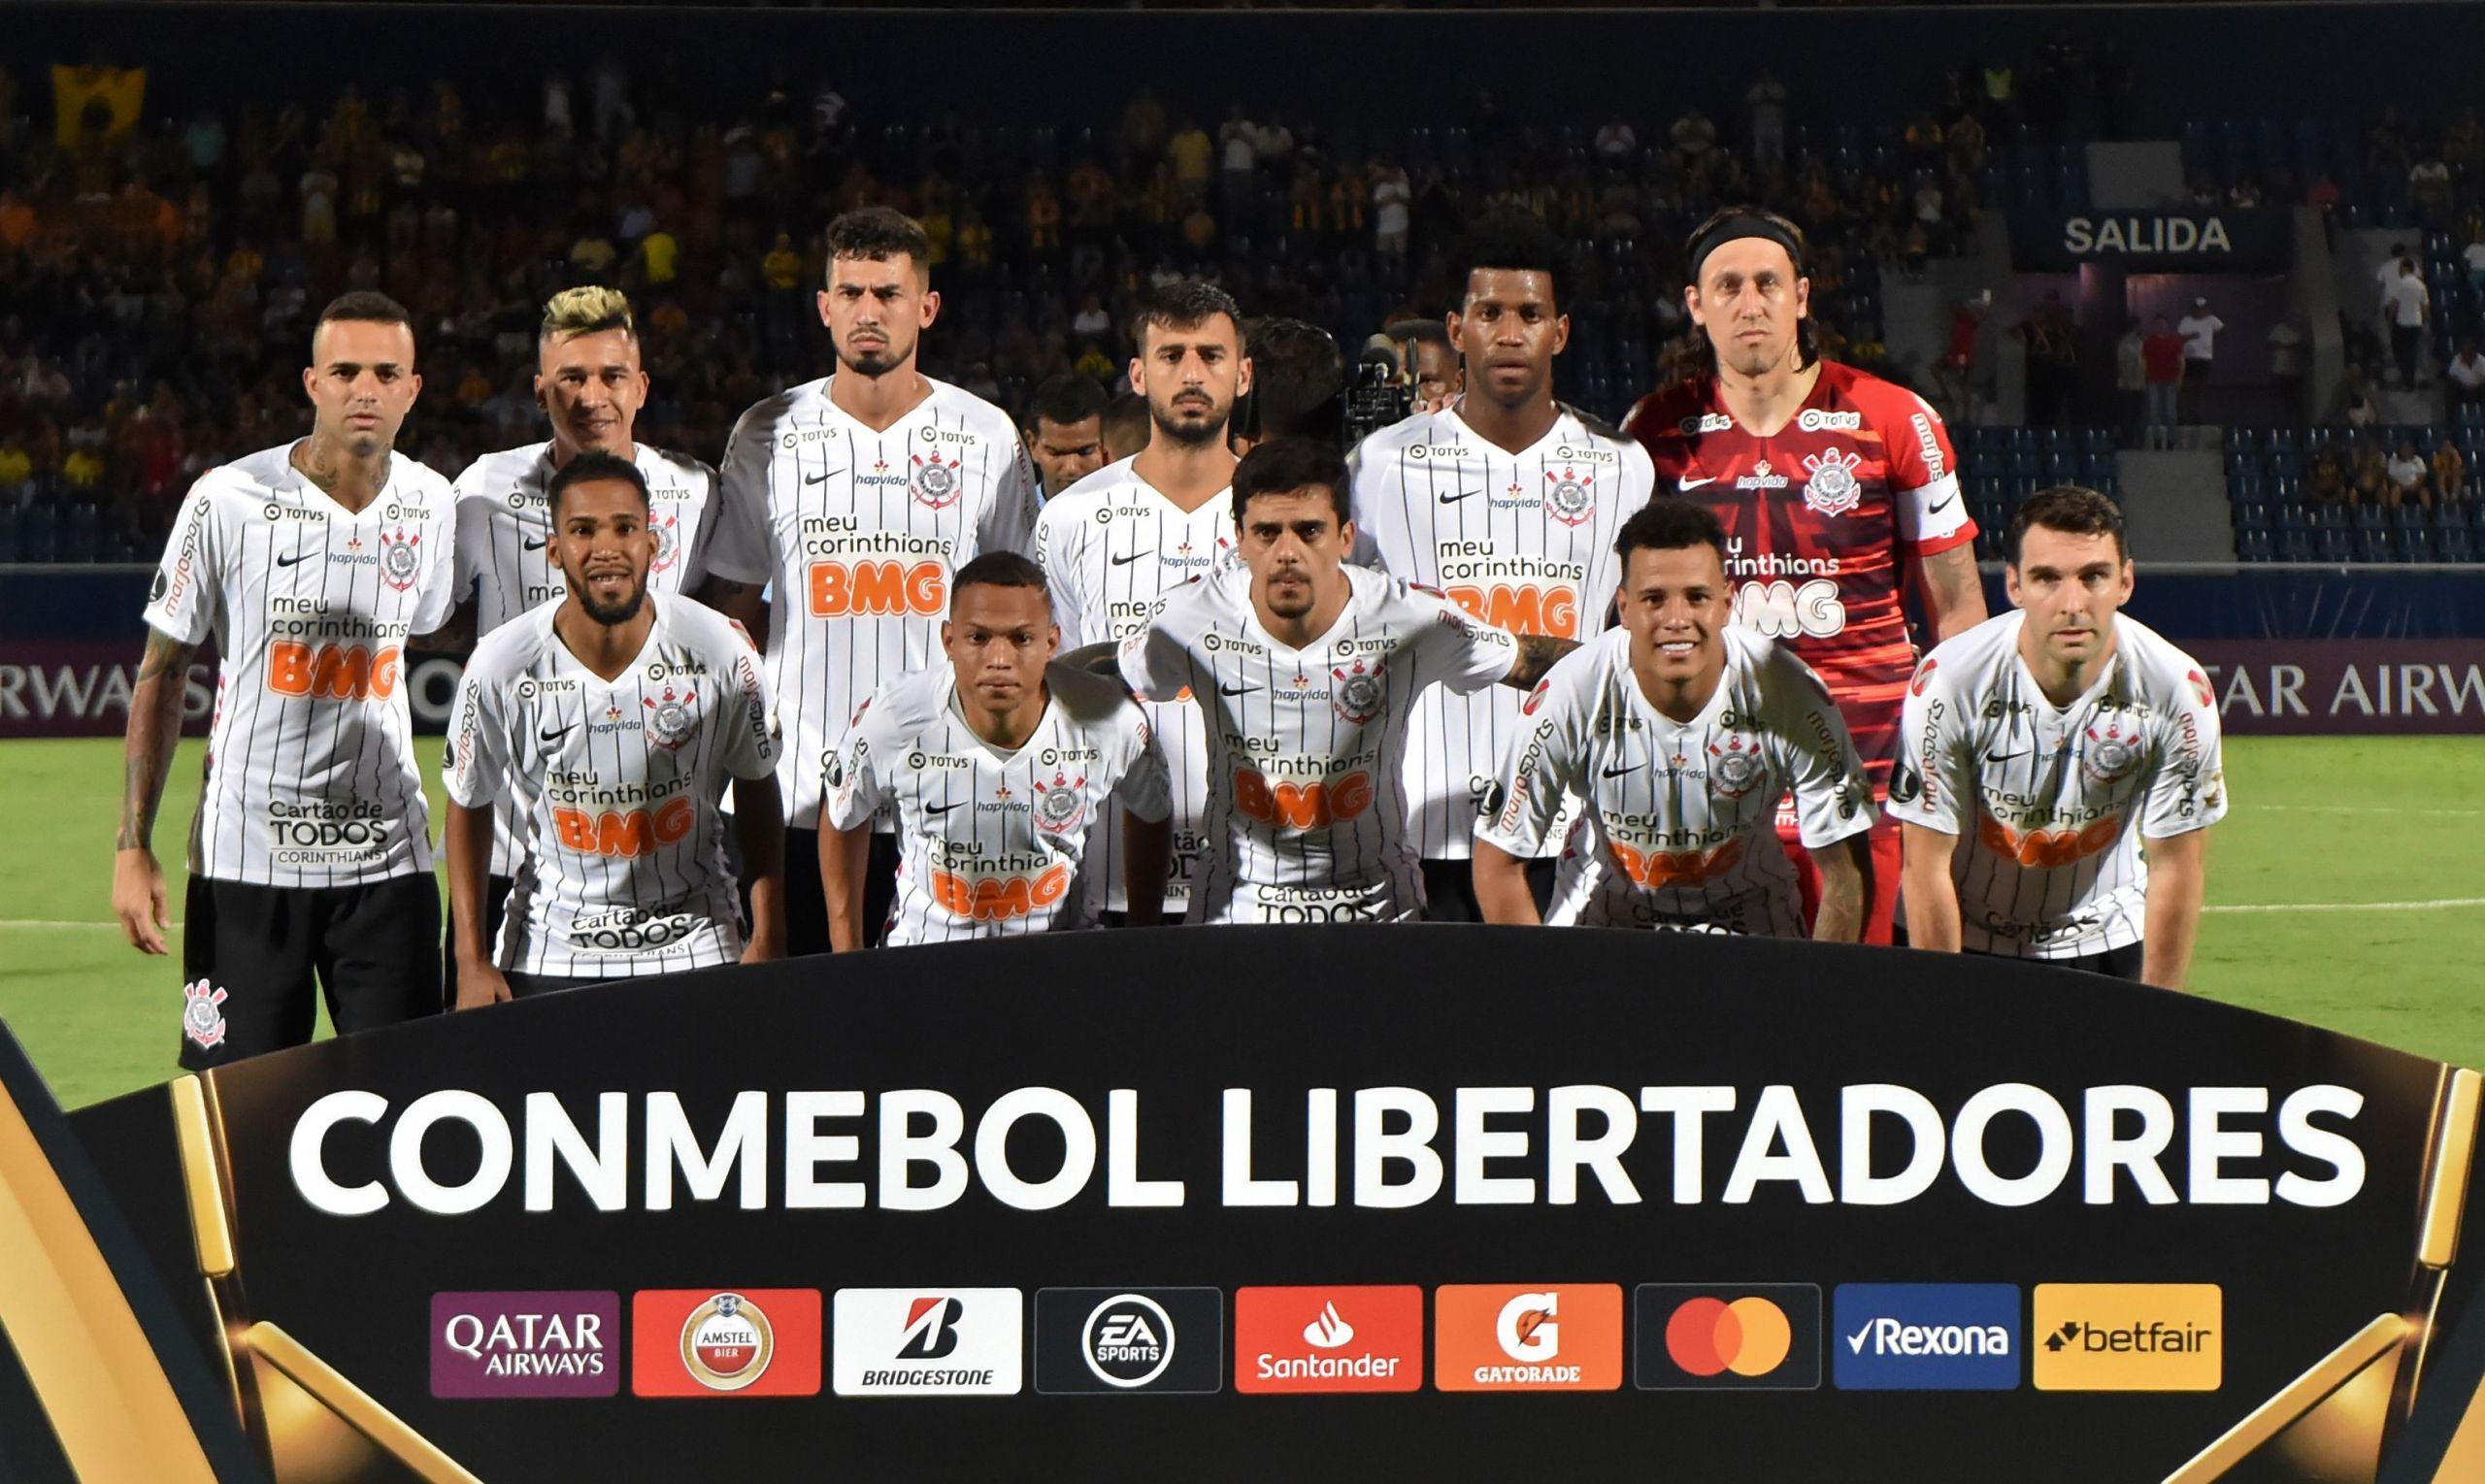 Guarani 1 x 0 Corinthians - Libertadores 2020